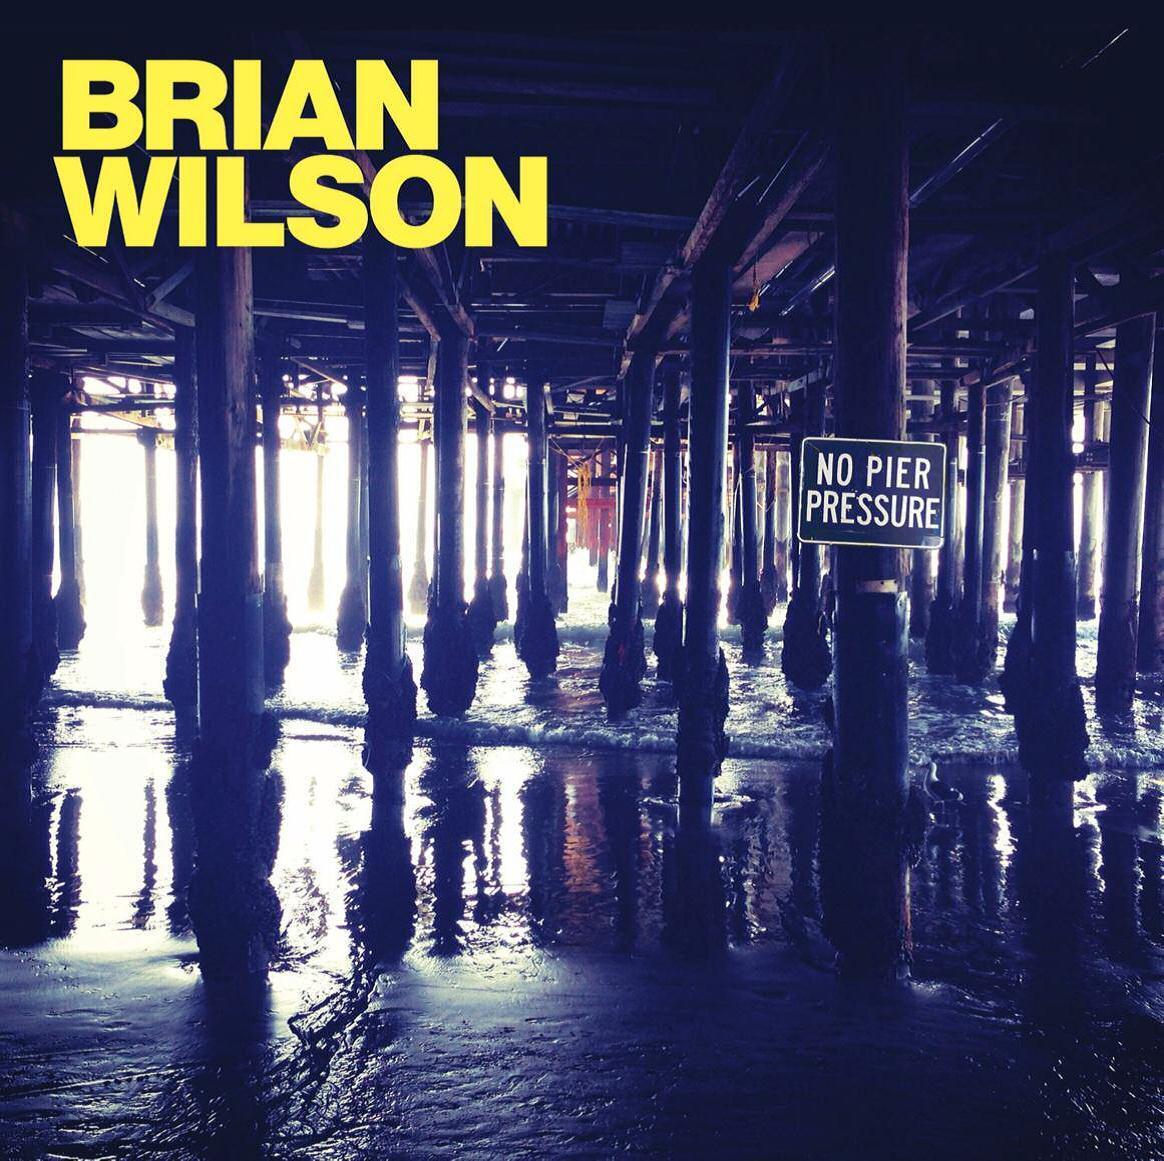 NO PIER PRESSURE - BRIAN WILSON - CD -